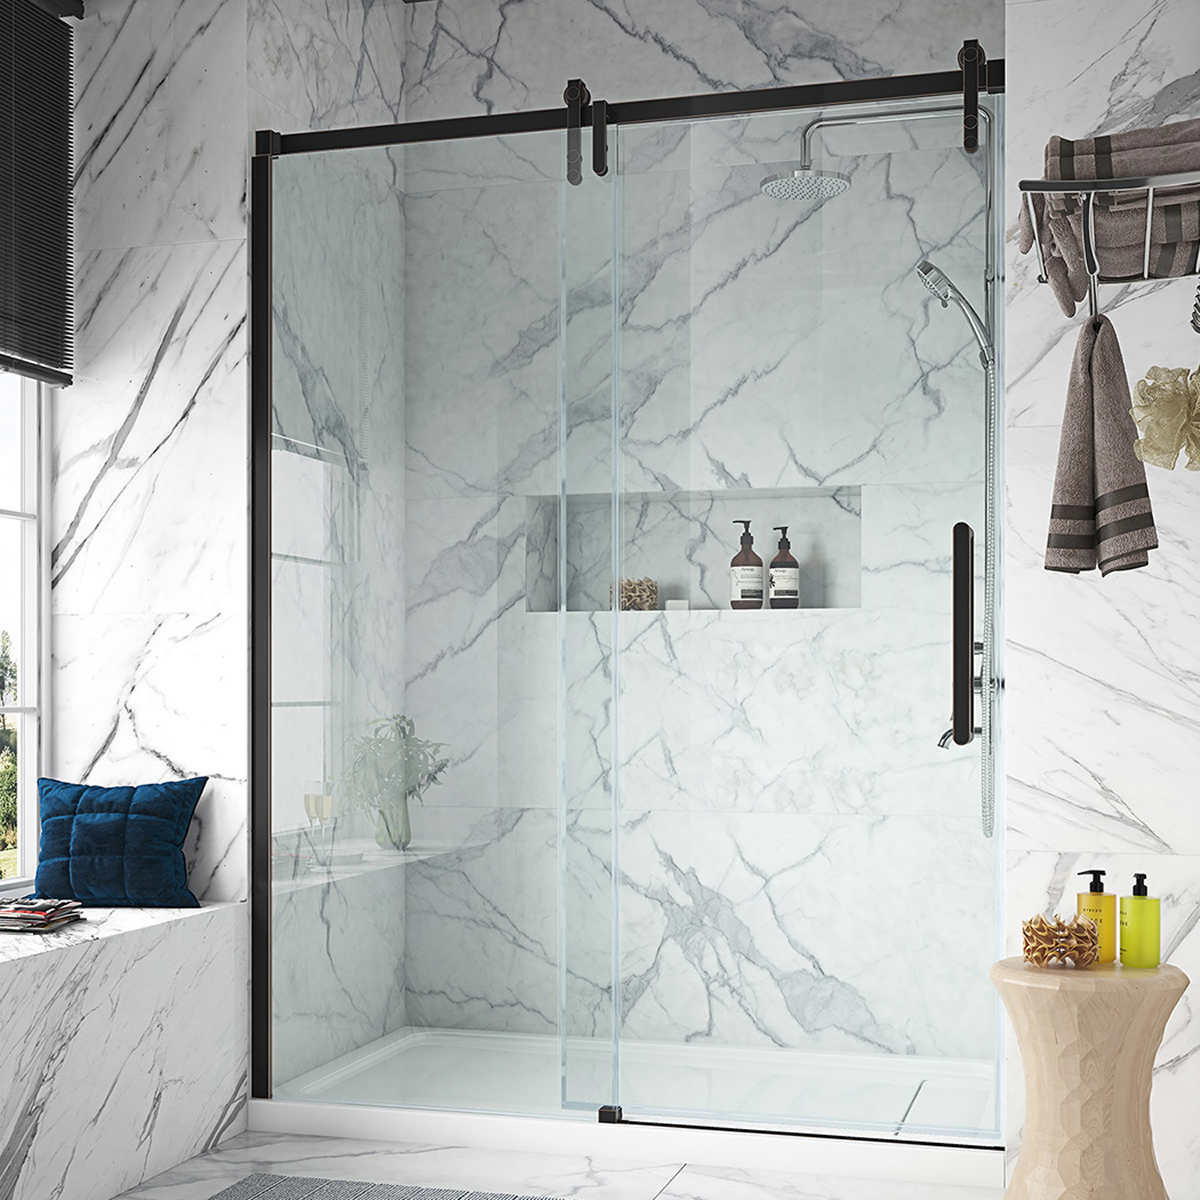 Ove Decors Sheffield 60 Tempered Glass Shower Door